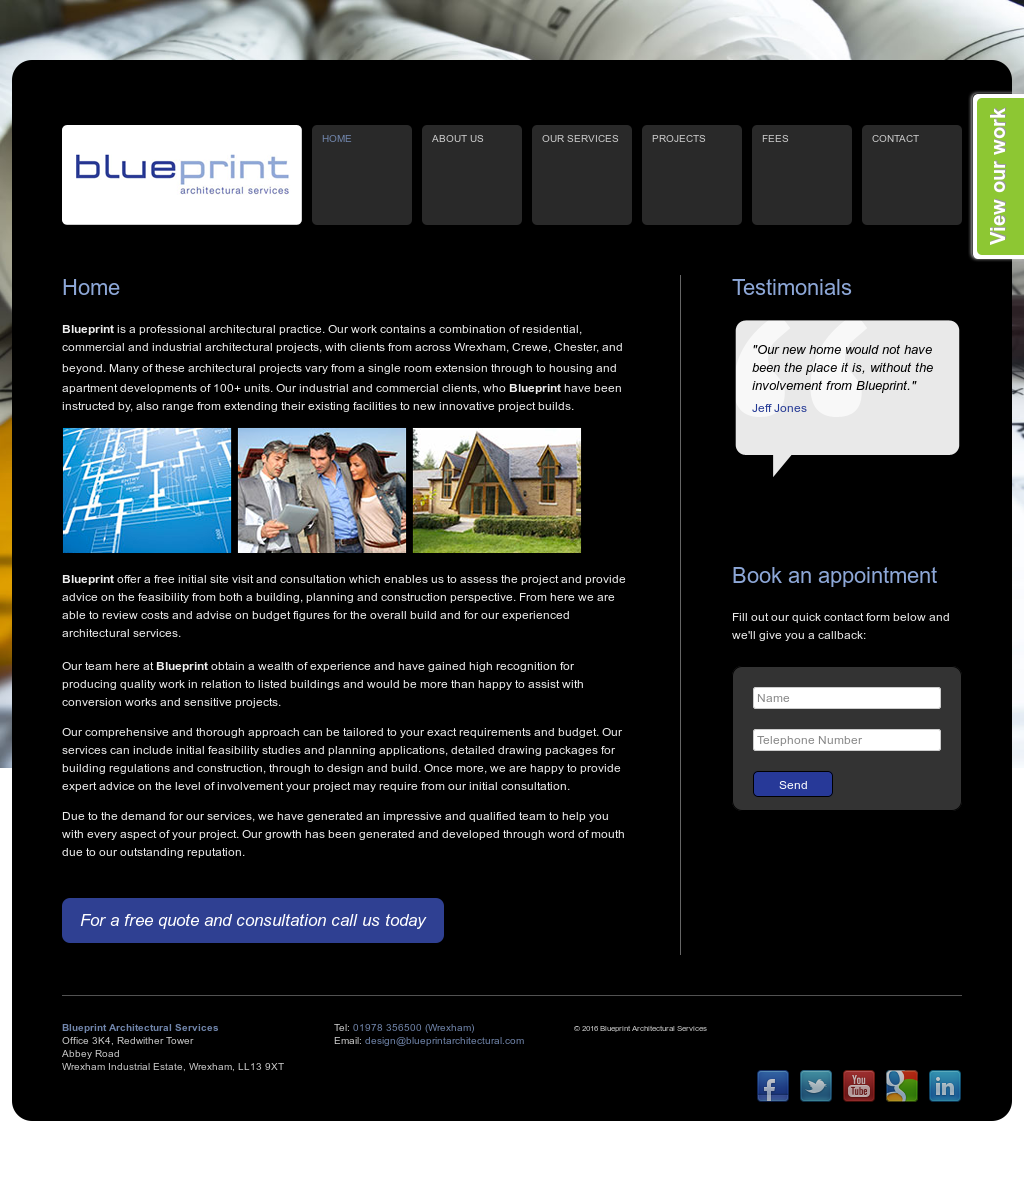 Blueprint architectural services competitors revenue and employees blueprint architectural services competitors revenue and employees owler company profile malvernweather Images